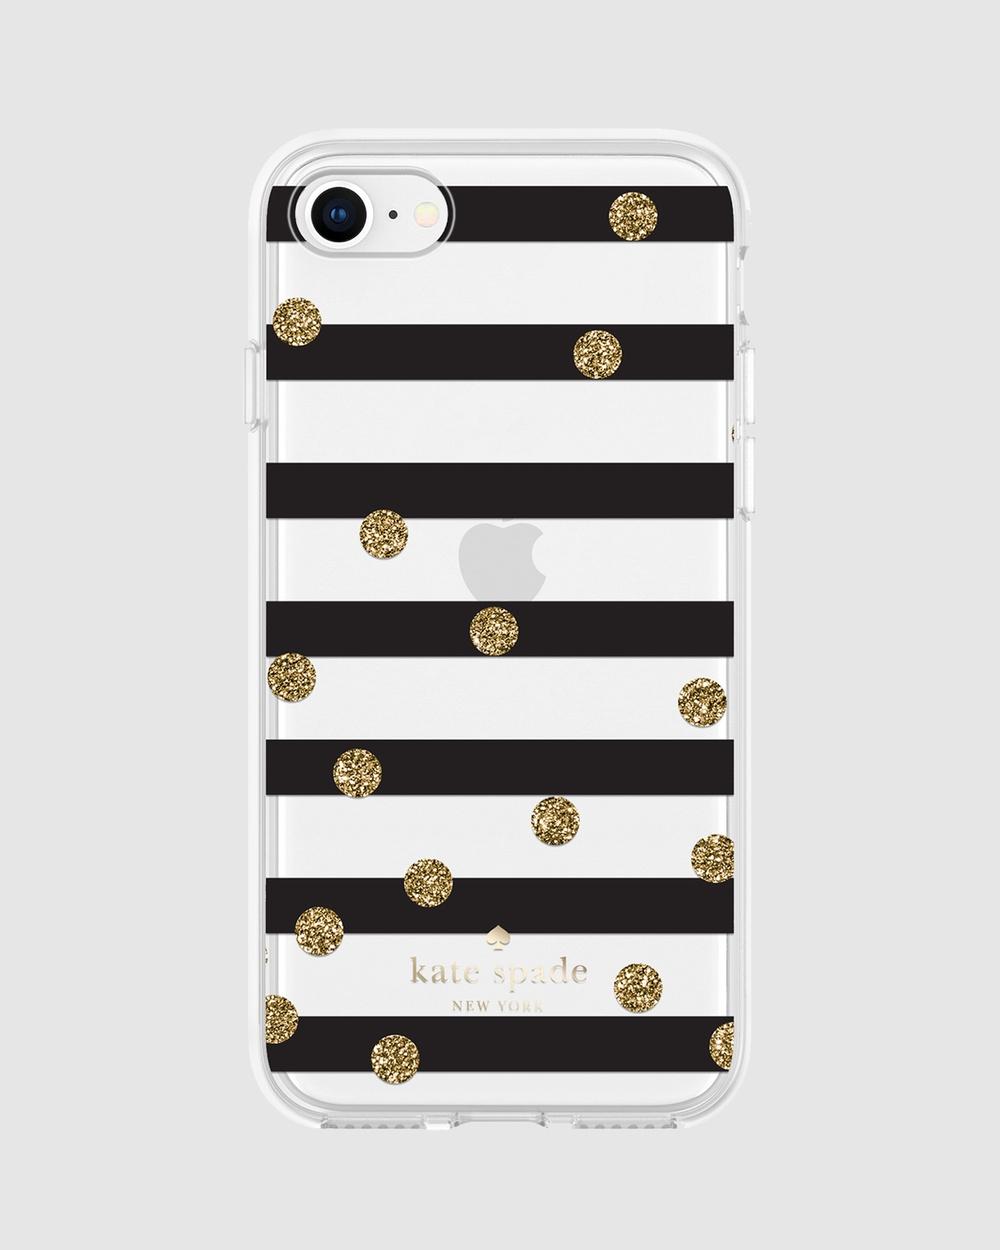 Kate Spade iPhone SE,8,7,6 Protective Hardshell Case Tech Accessories Multi Australia